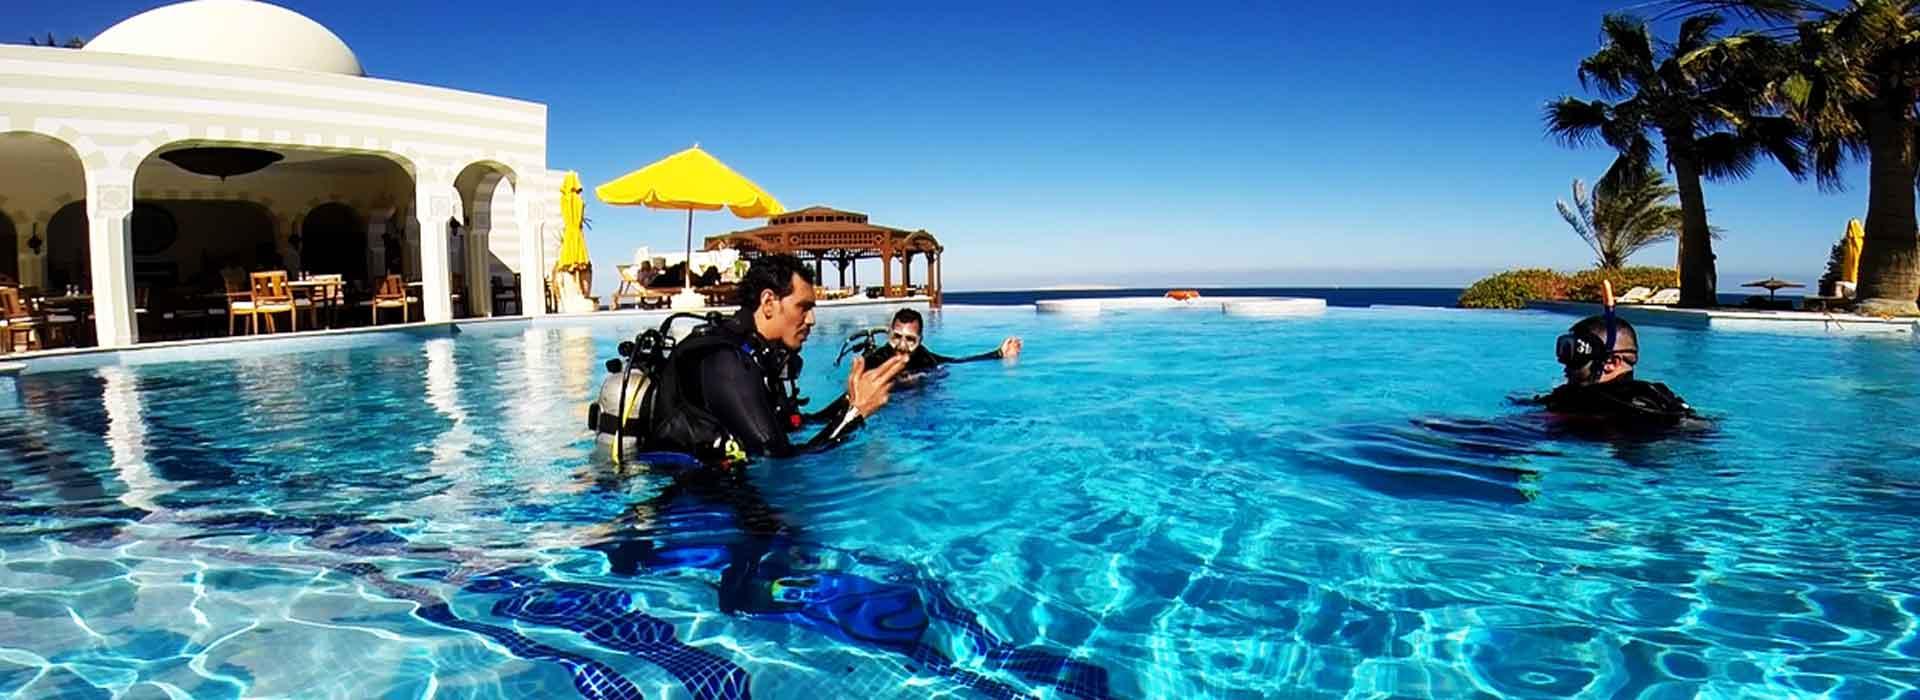 dive pro- training